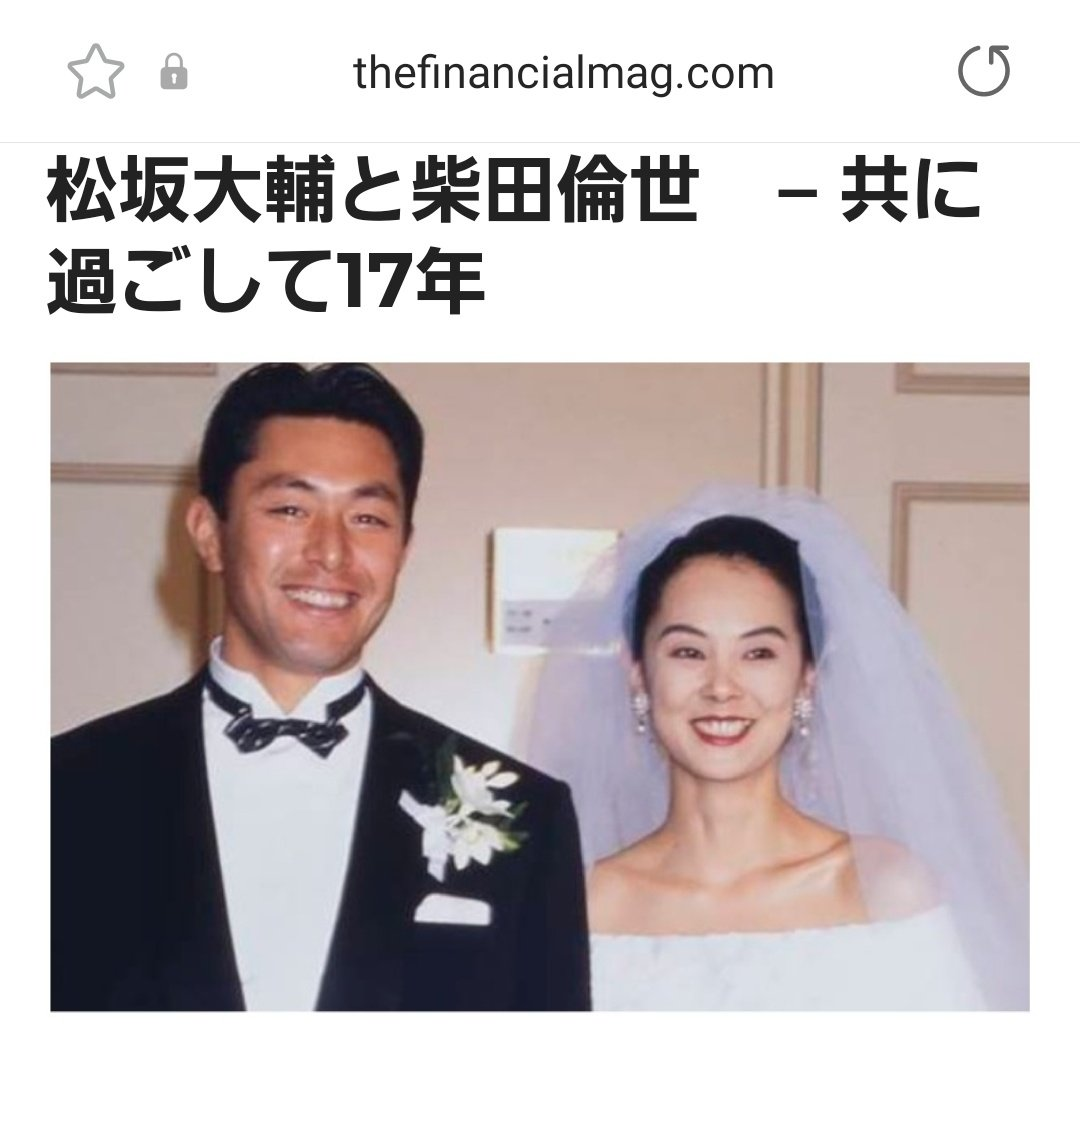 test ツイッターメディア - 昨夜Yahooニュース見てたら『仲村トオルの妻がこんな人だったなんて』って見出しの記事があって、鷲尾いさ子今はどんな感じになってんだろ~?🤔と思い、見てみたら芸能人カップルの夫婦がず~っと紹介されてて仲村トオル夫婦いつまで経っても出てこず『松坂大輔』の見出しでまさかの荒木大輔(-_-;) https://t.co/vn8e1T5e6k